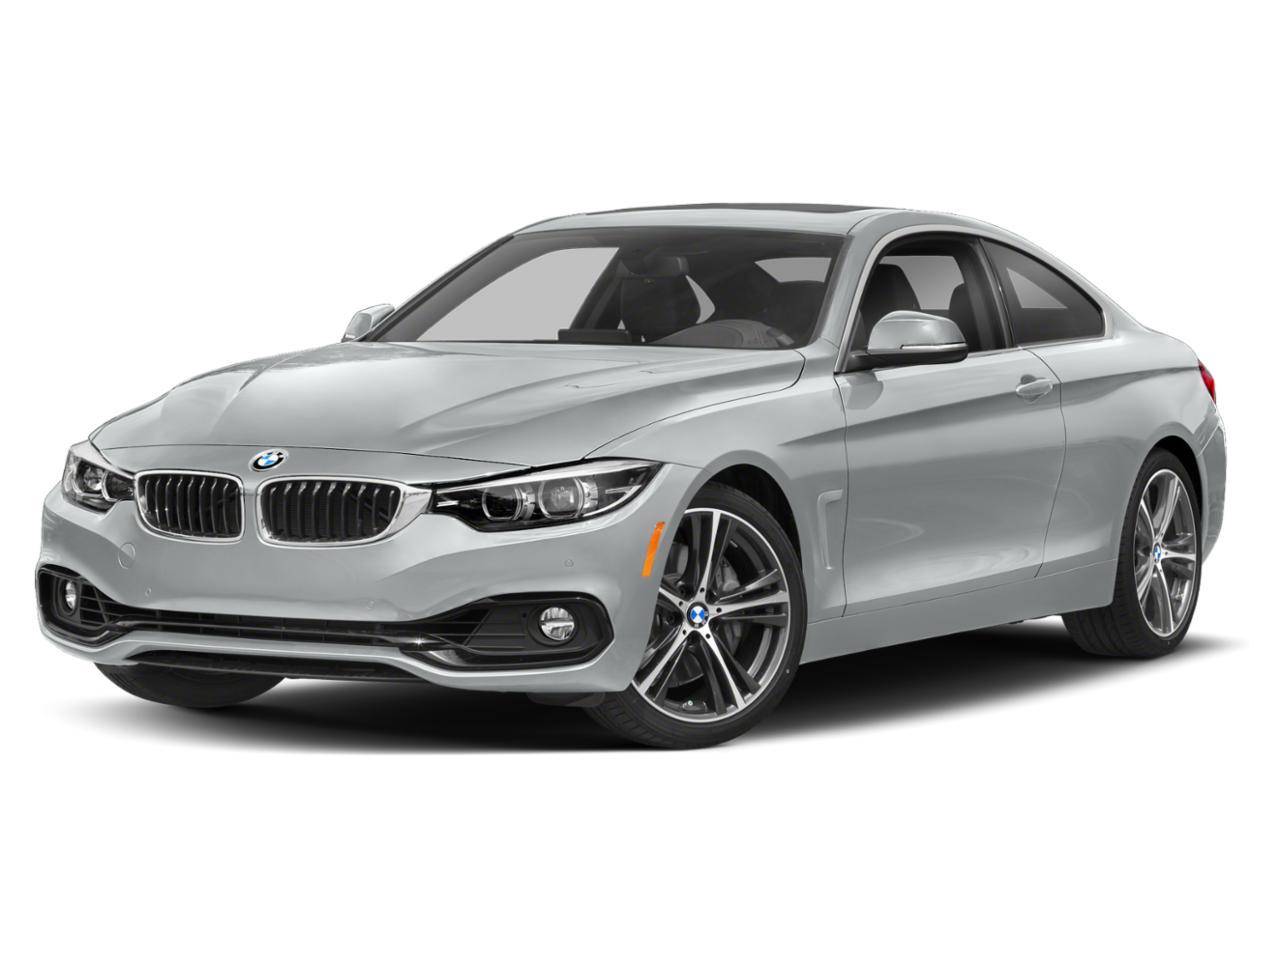 2018 BMW 440i Vehicle Photo in Charleston, SC 29407